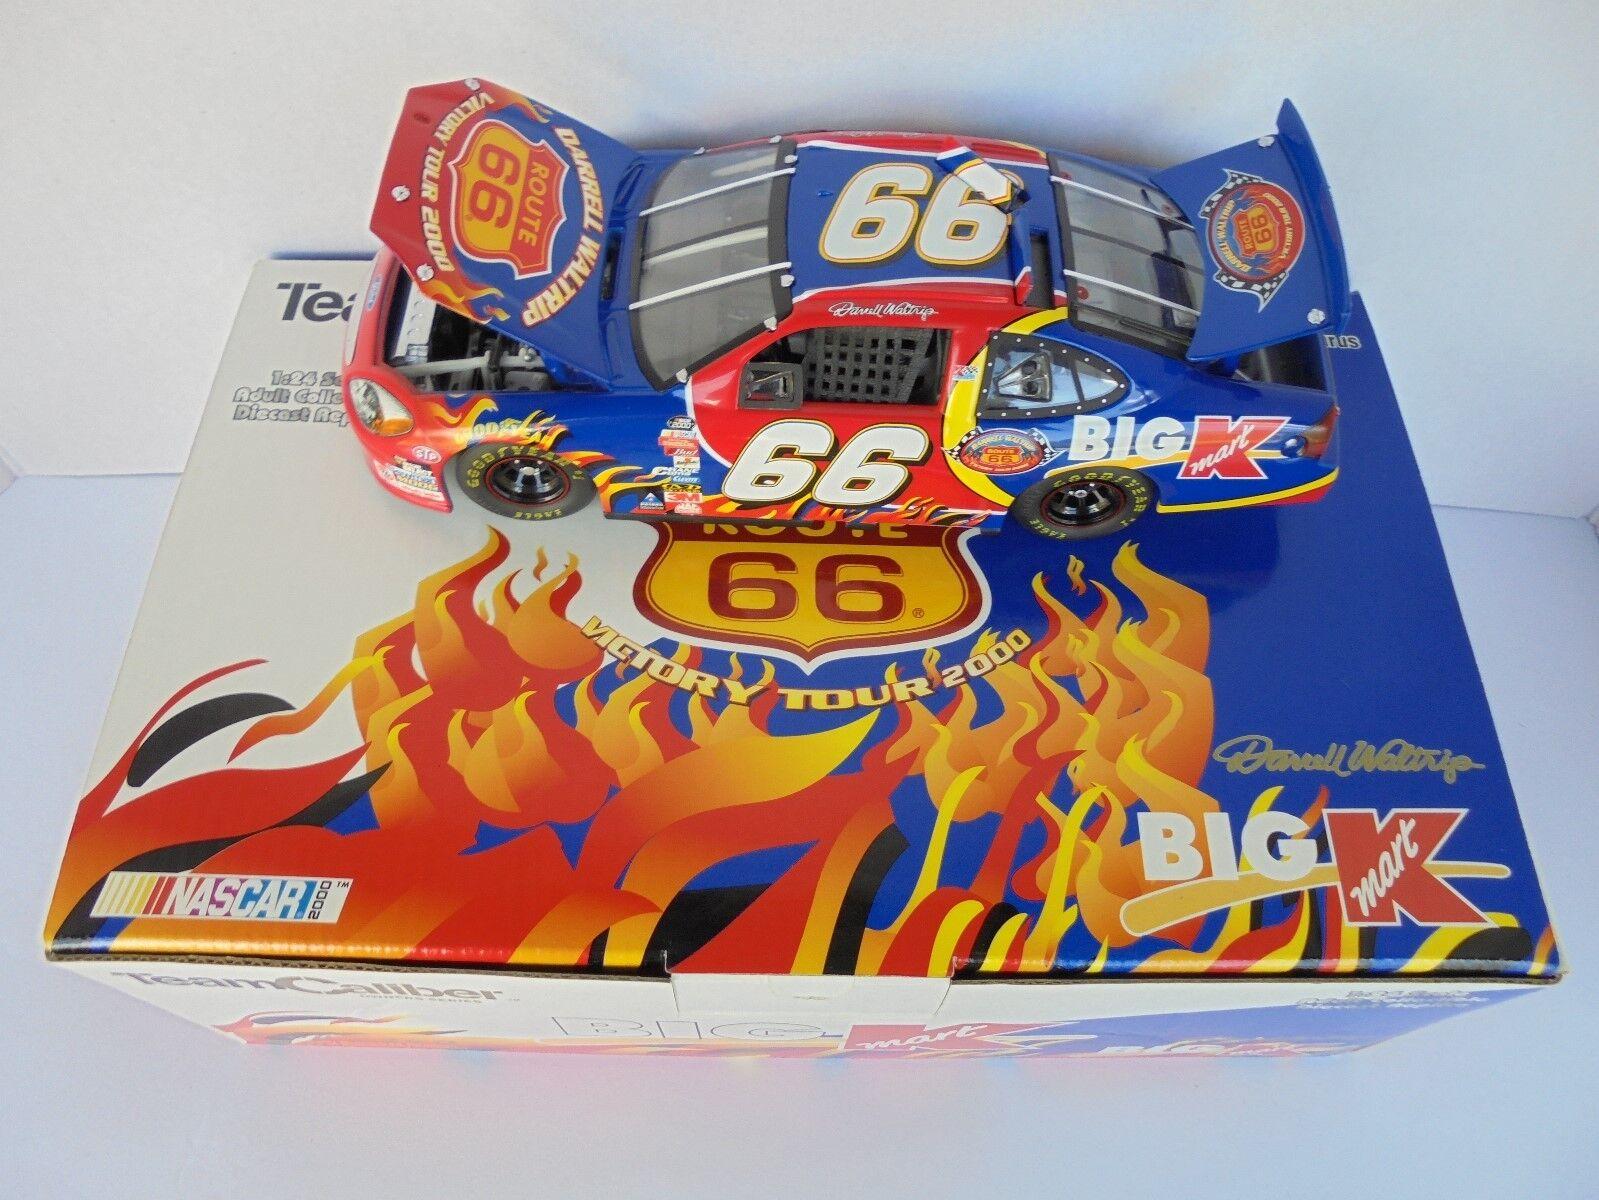 Darrell Waltrip Route 66 Victory Tour 2000 FORD TAURUS Terminaison 1 24 NASCAR Diecast